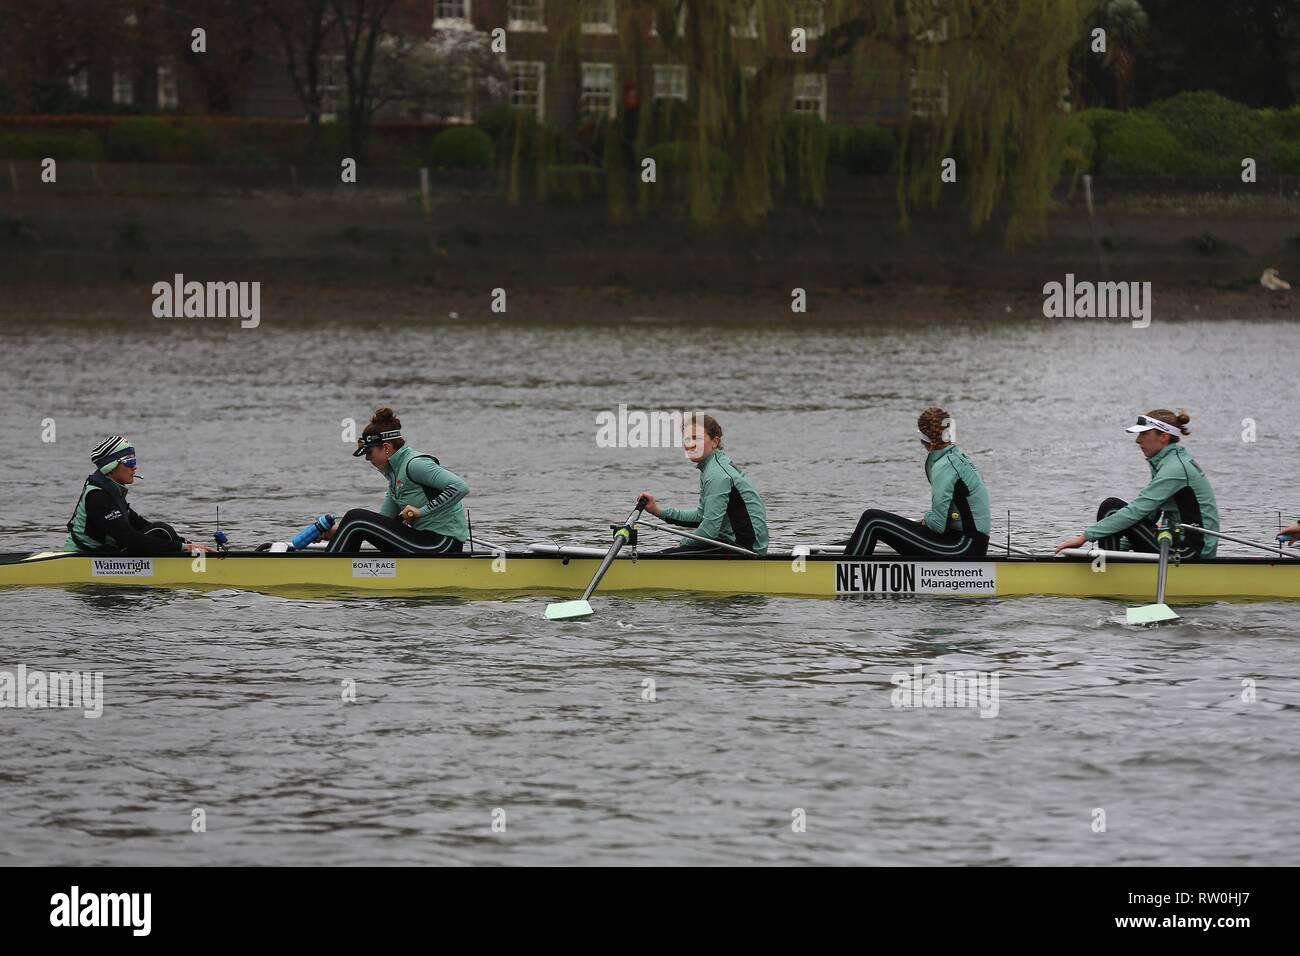 The Boat Race CUWBC vs Oxford Brookes  3 February 2019 - Stock Image